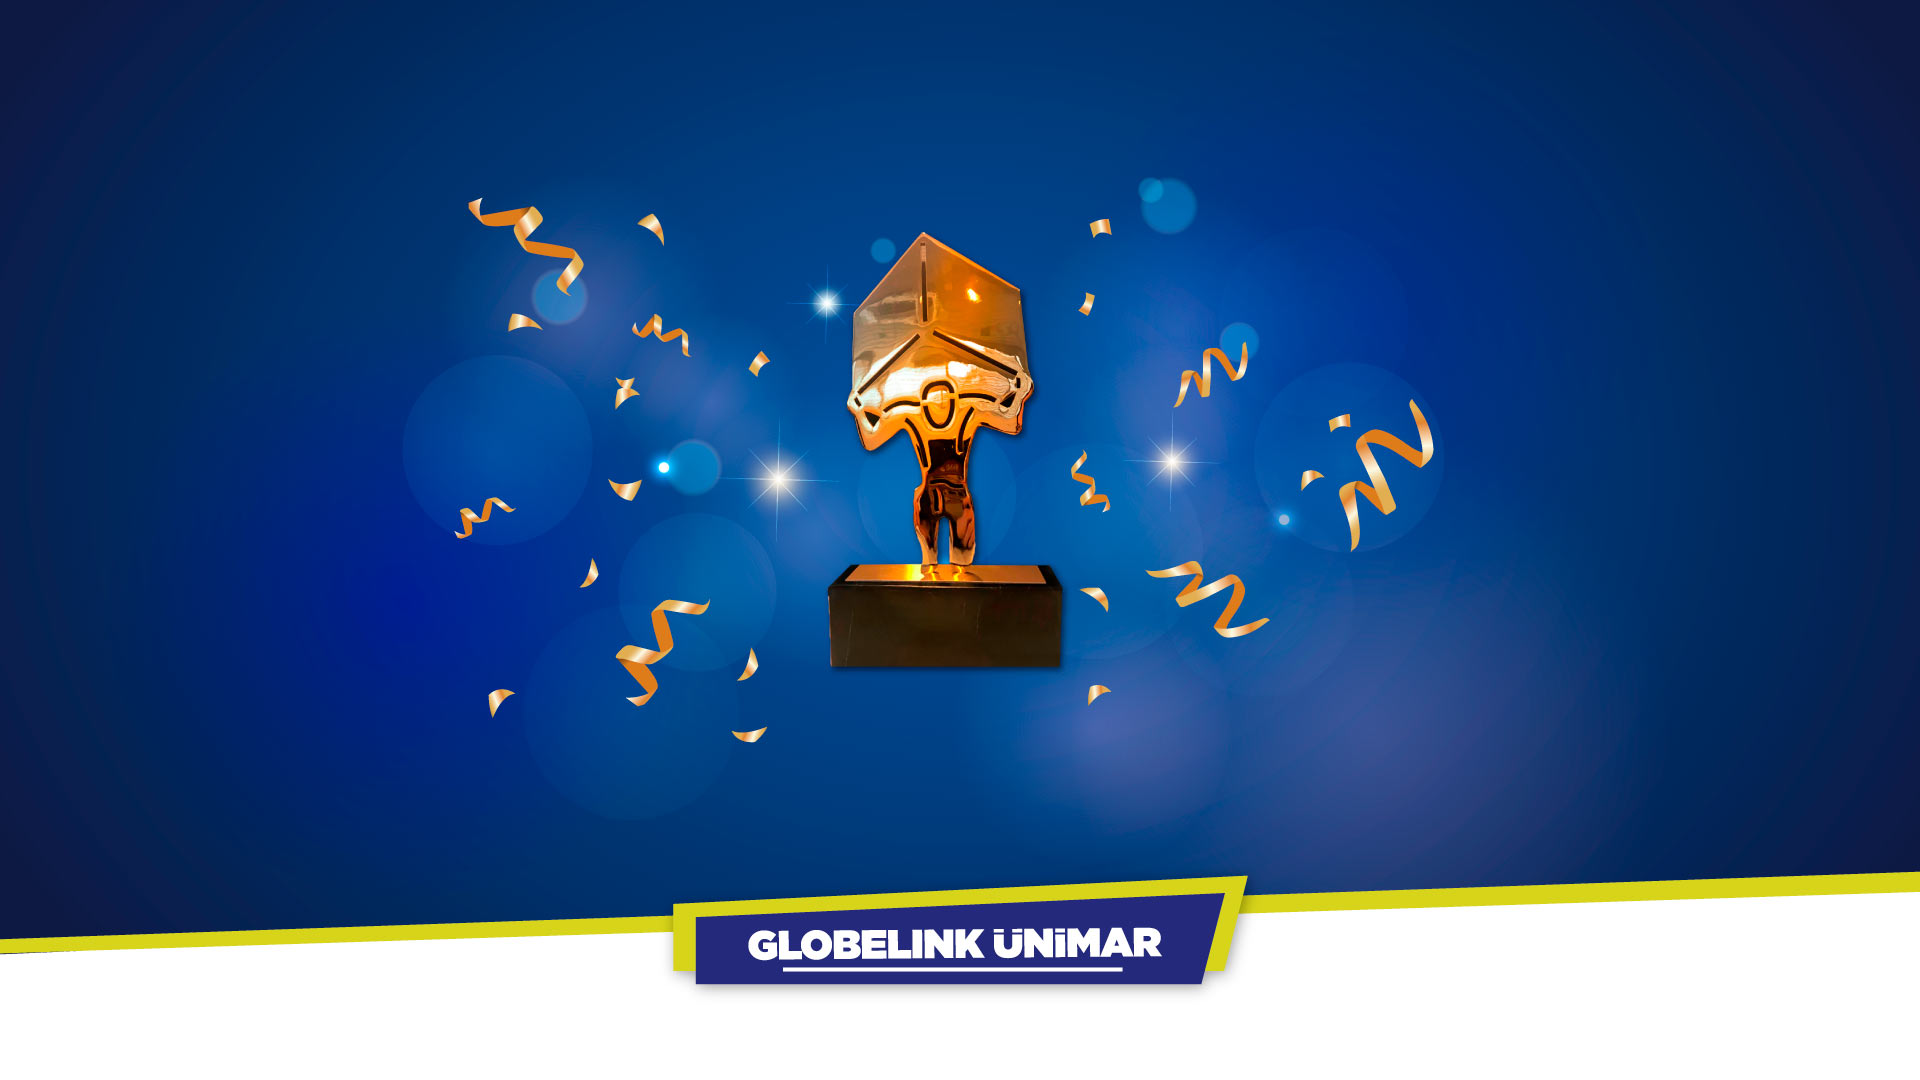 Globelink Ünimar Continues to Achieve Success in Atlas Logistics Awards